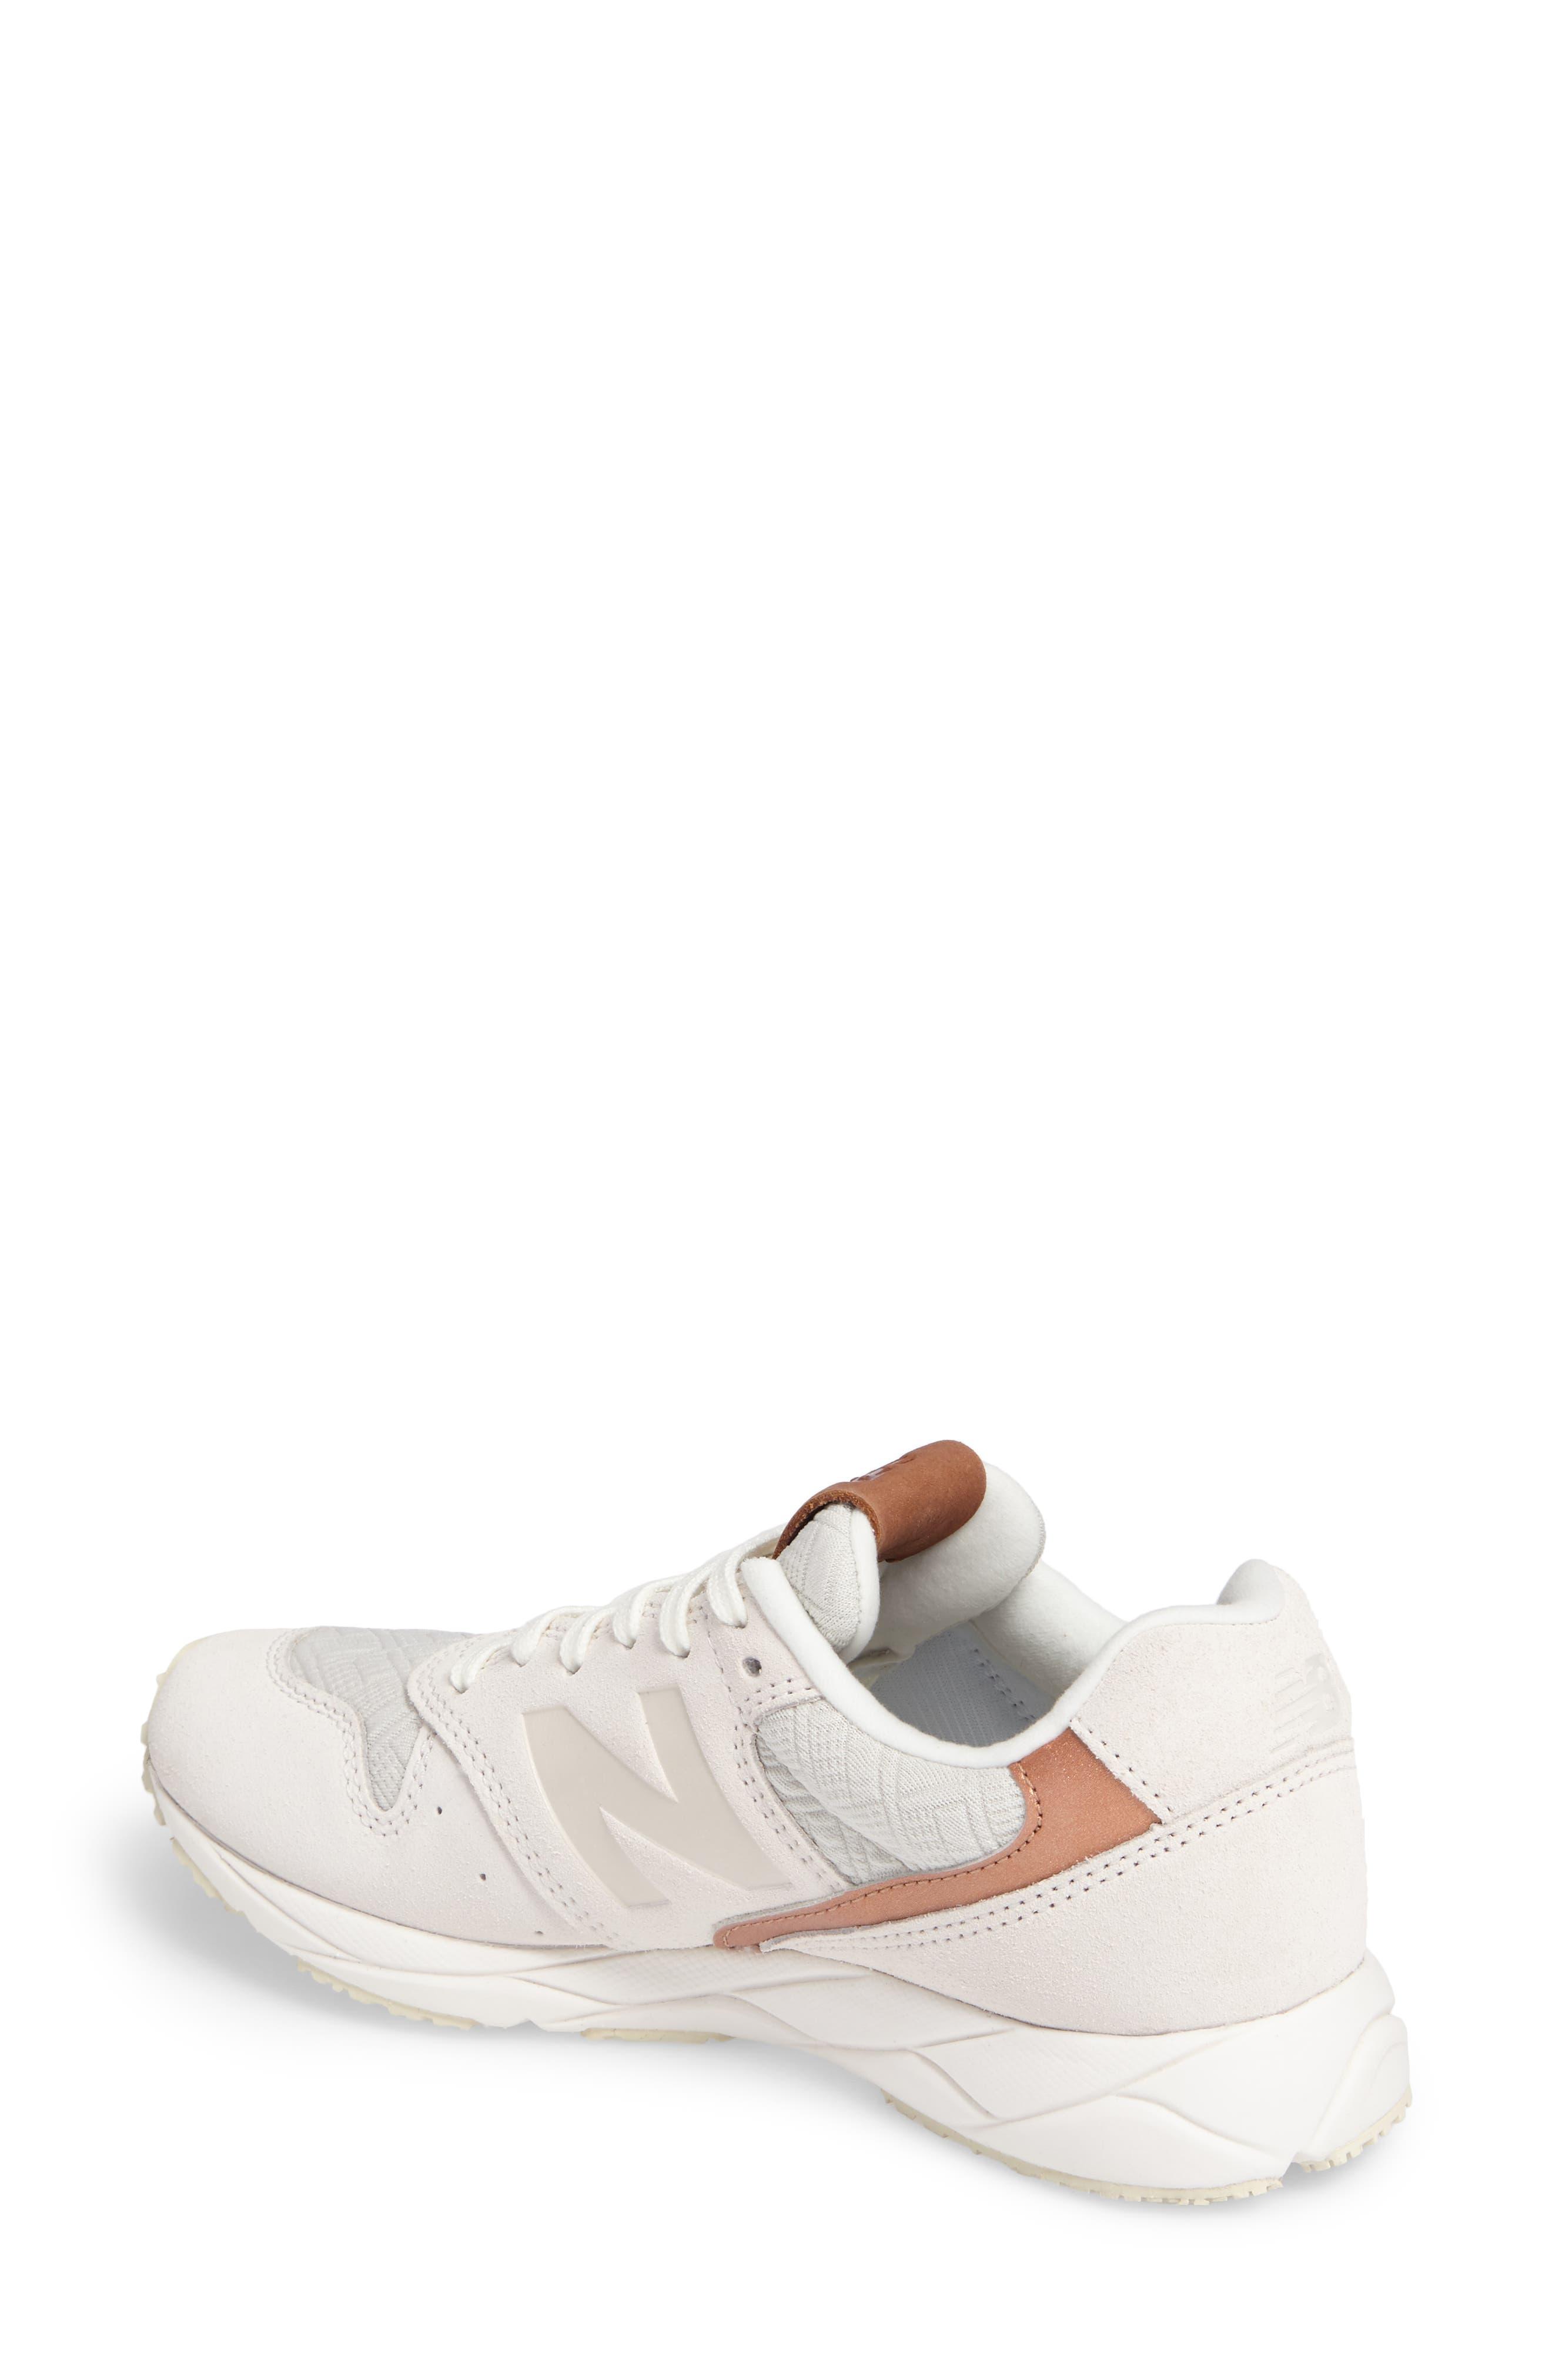 96 Mash-Up Sneaker,                             Alternate thumbnail 2, color,                             Sea Salt